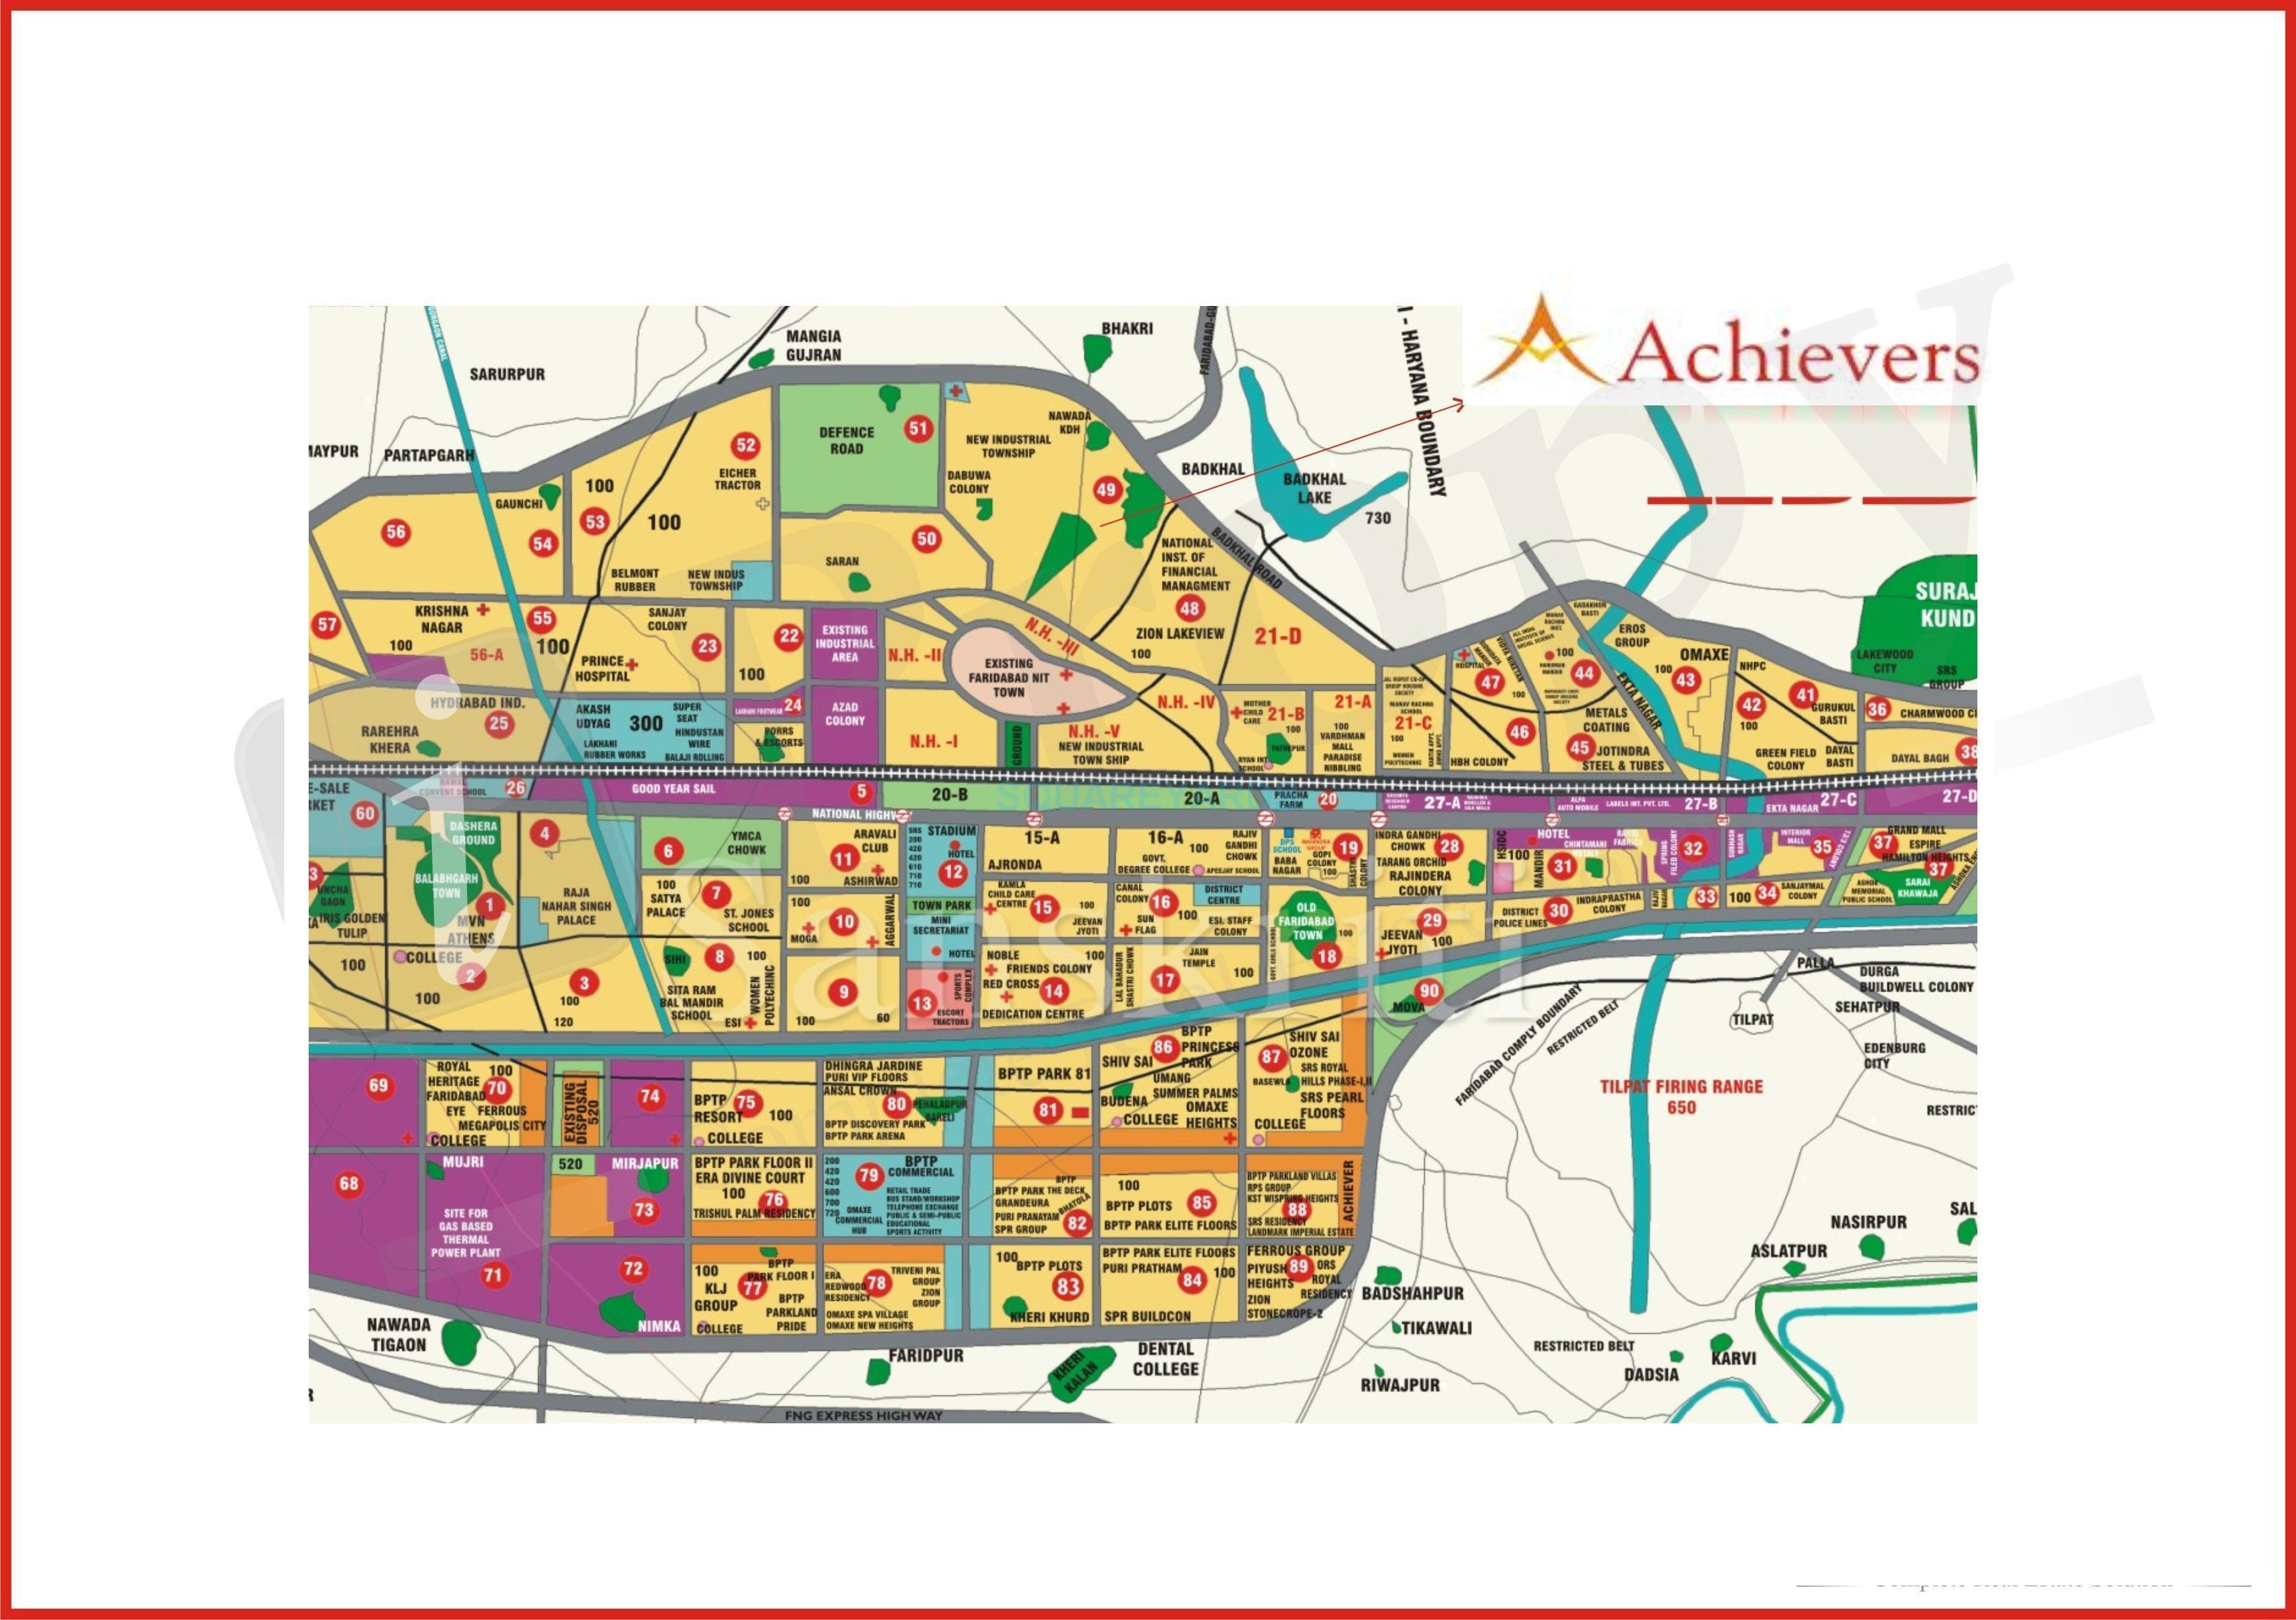 achievers builders status enclave location image1